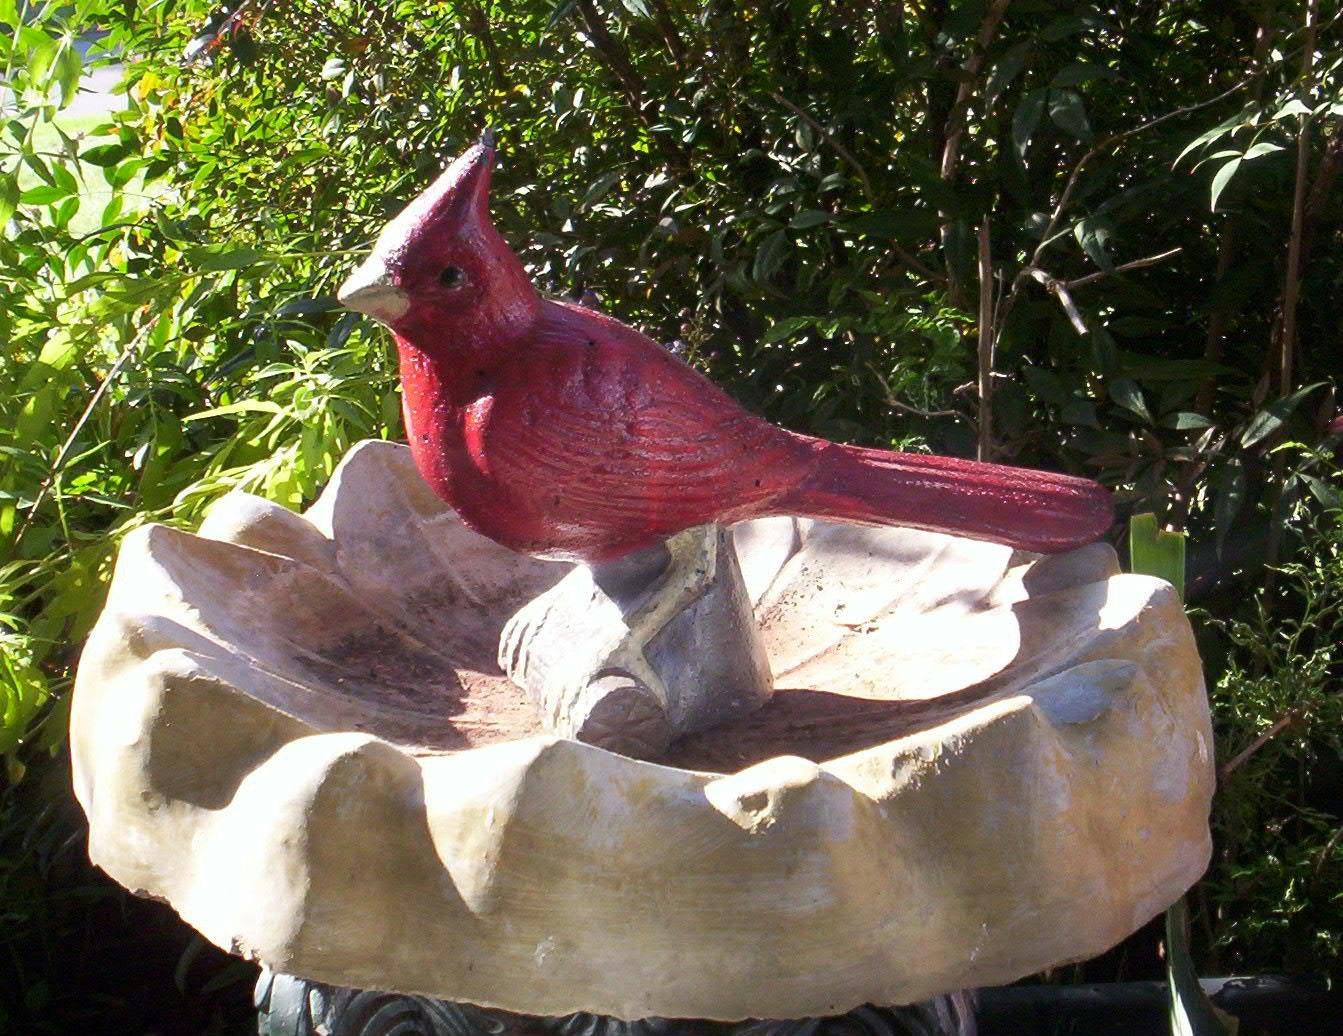 Classic Large Red Cardinal Bird Concrete Statue